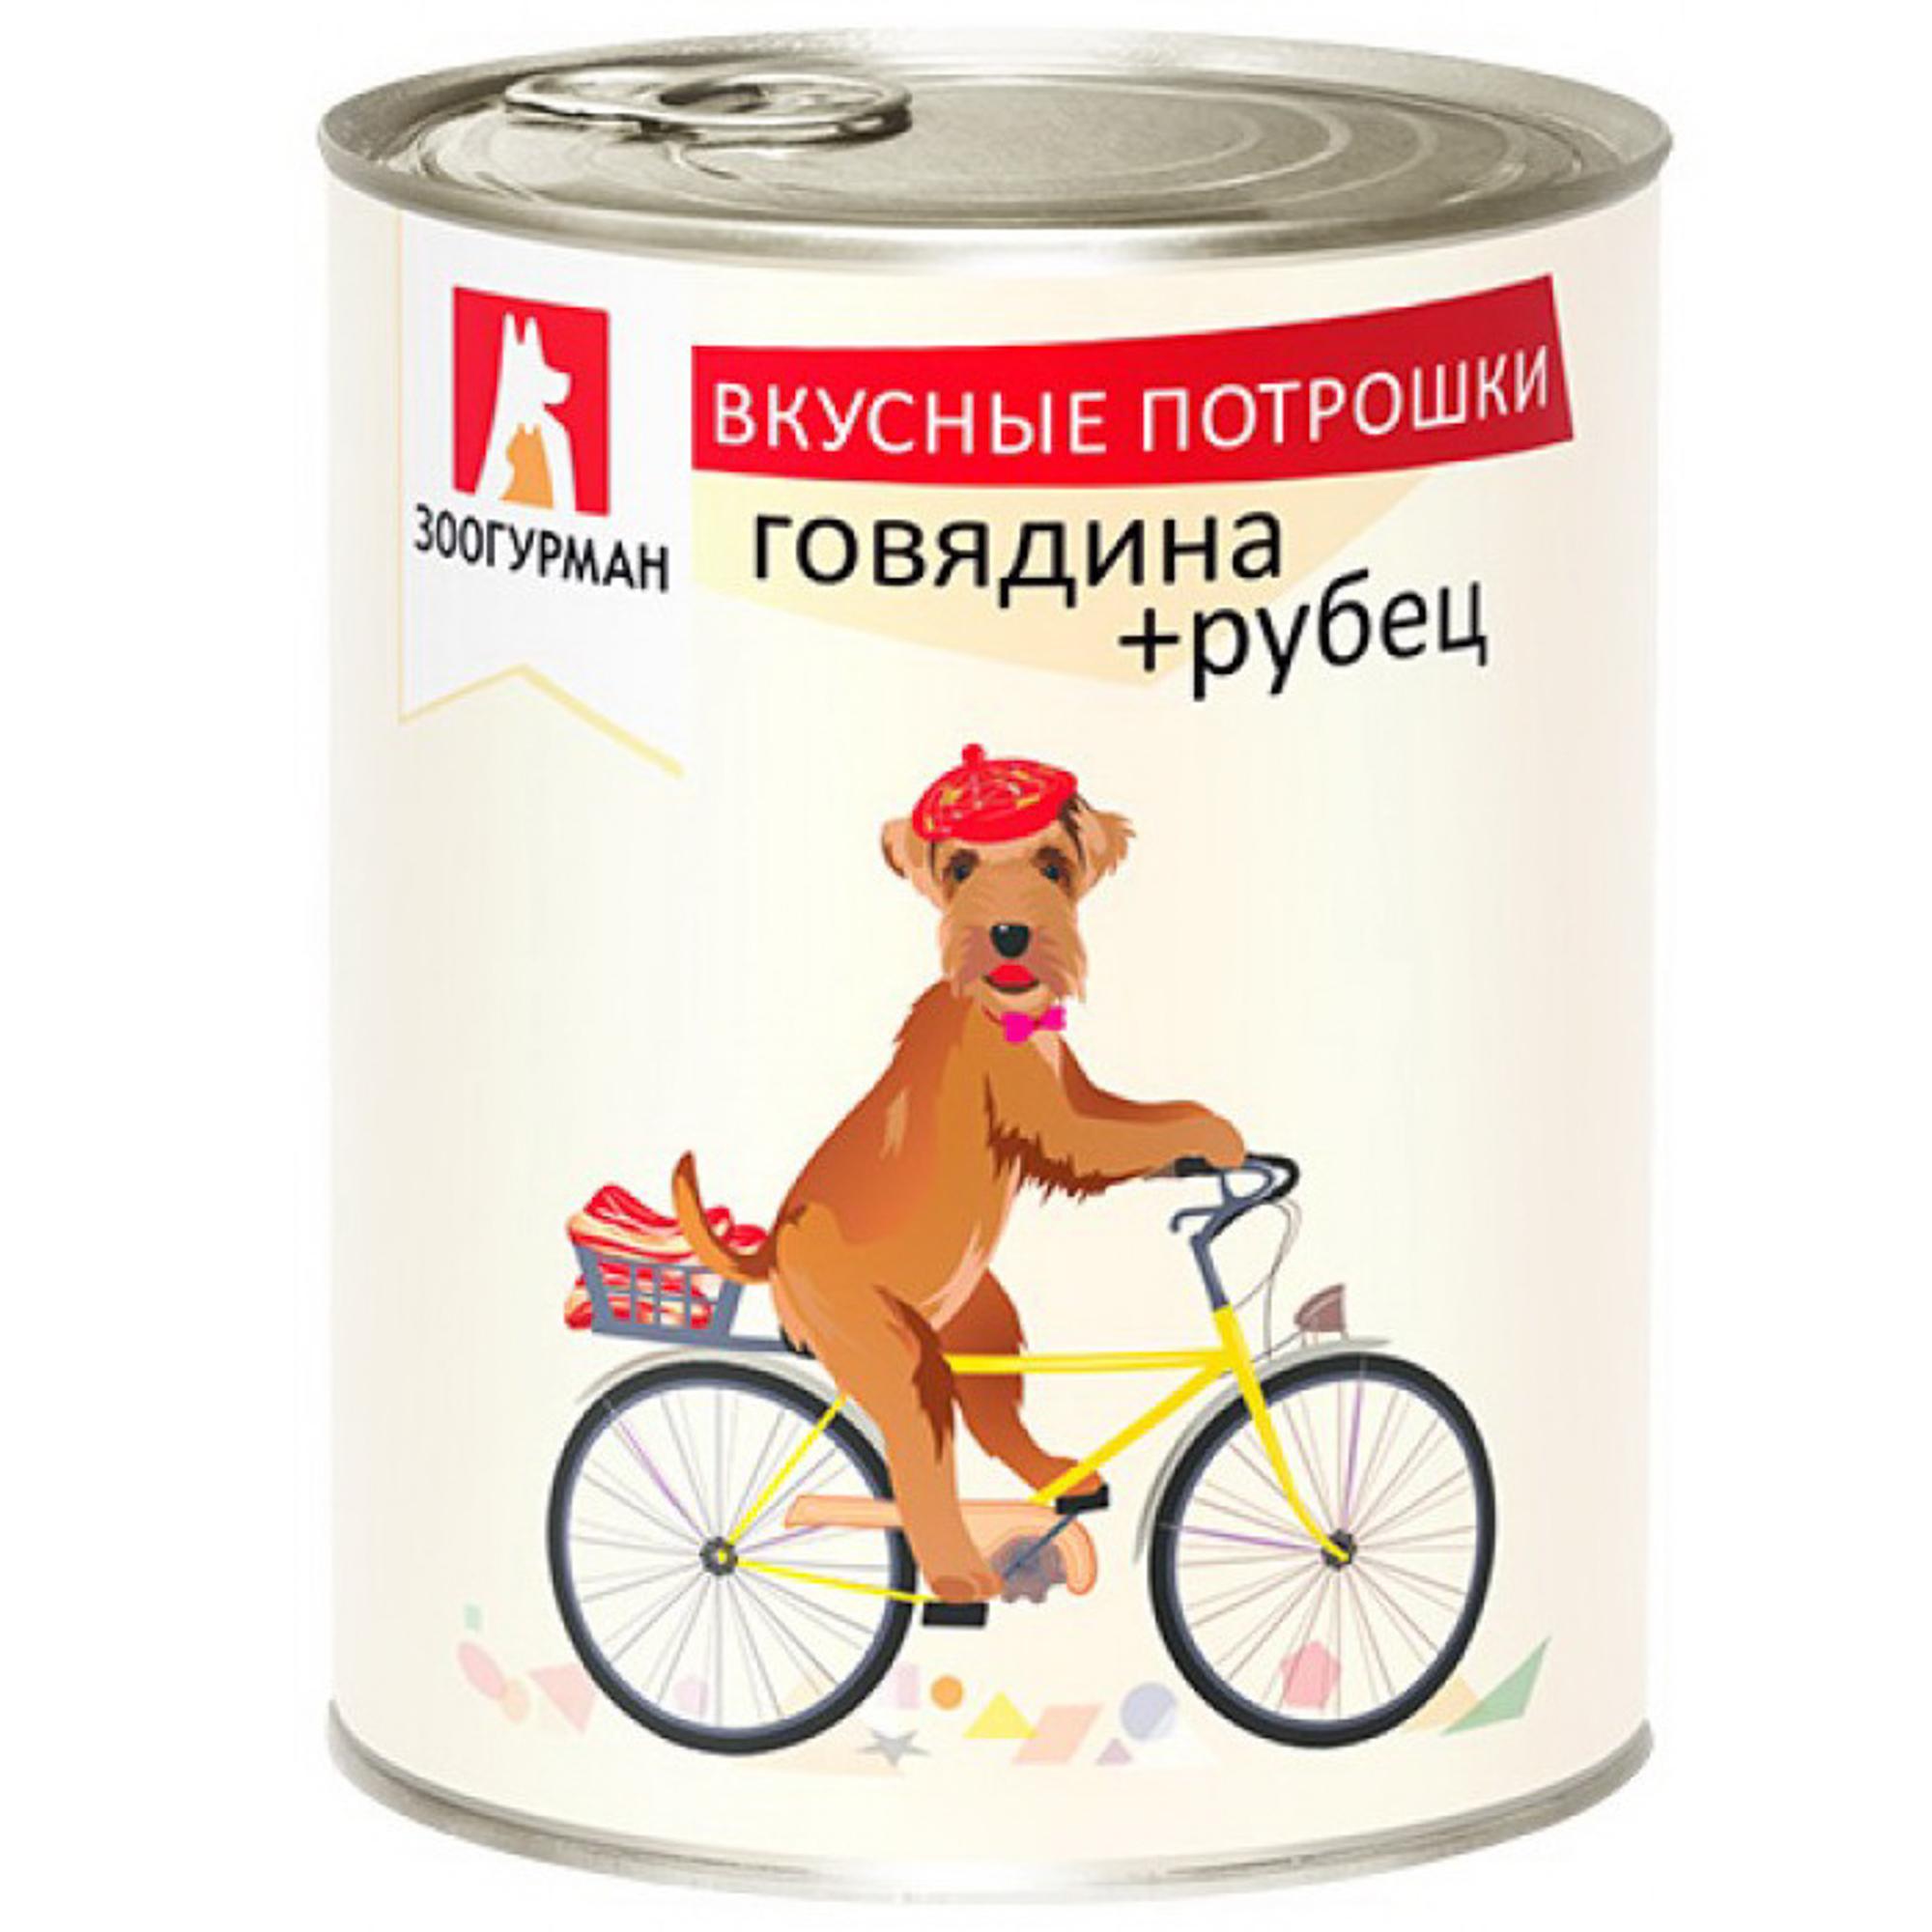 Корм для собак ЗООГУРМАН Вкусные потрошки говядина рубец 750 г.